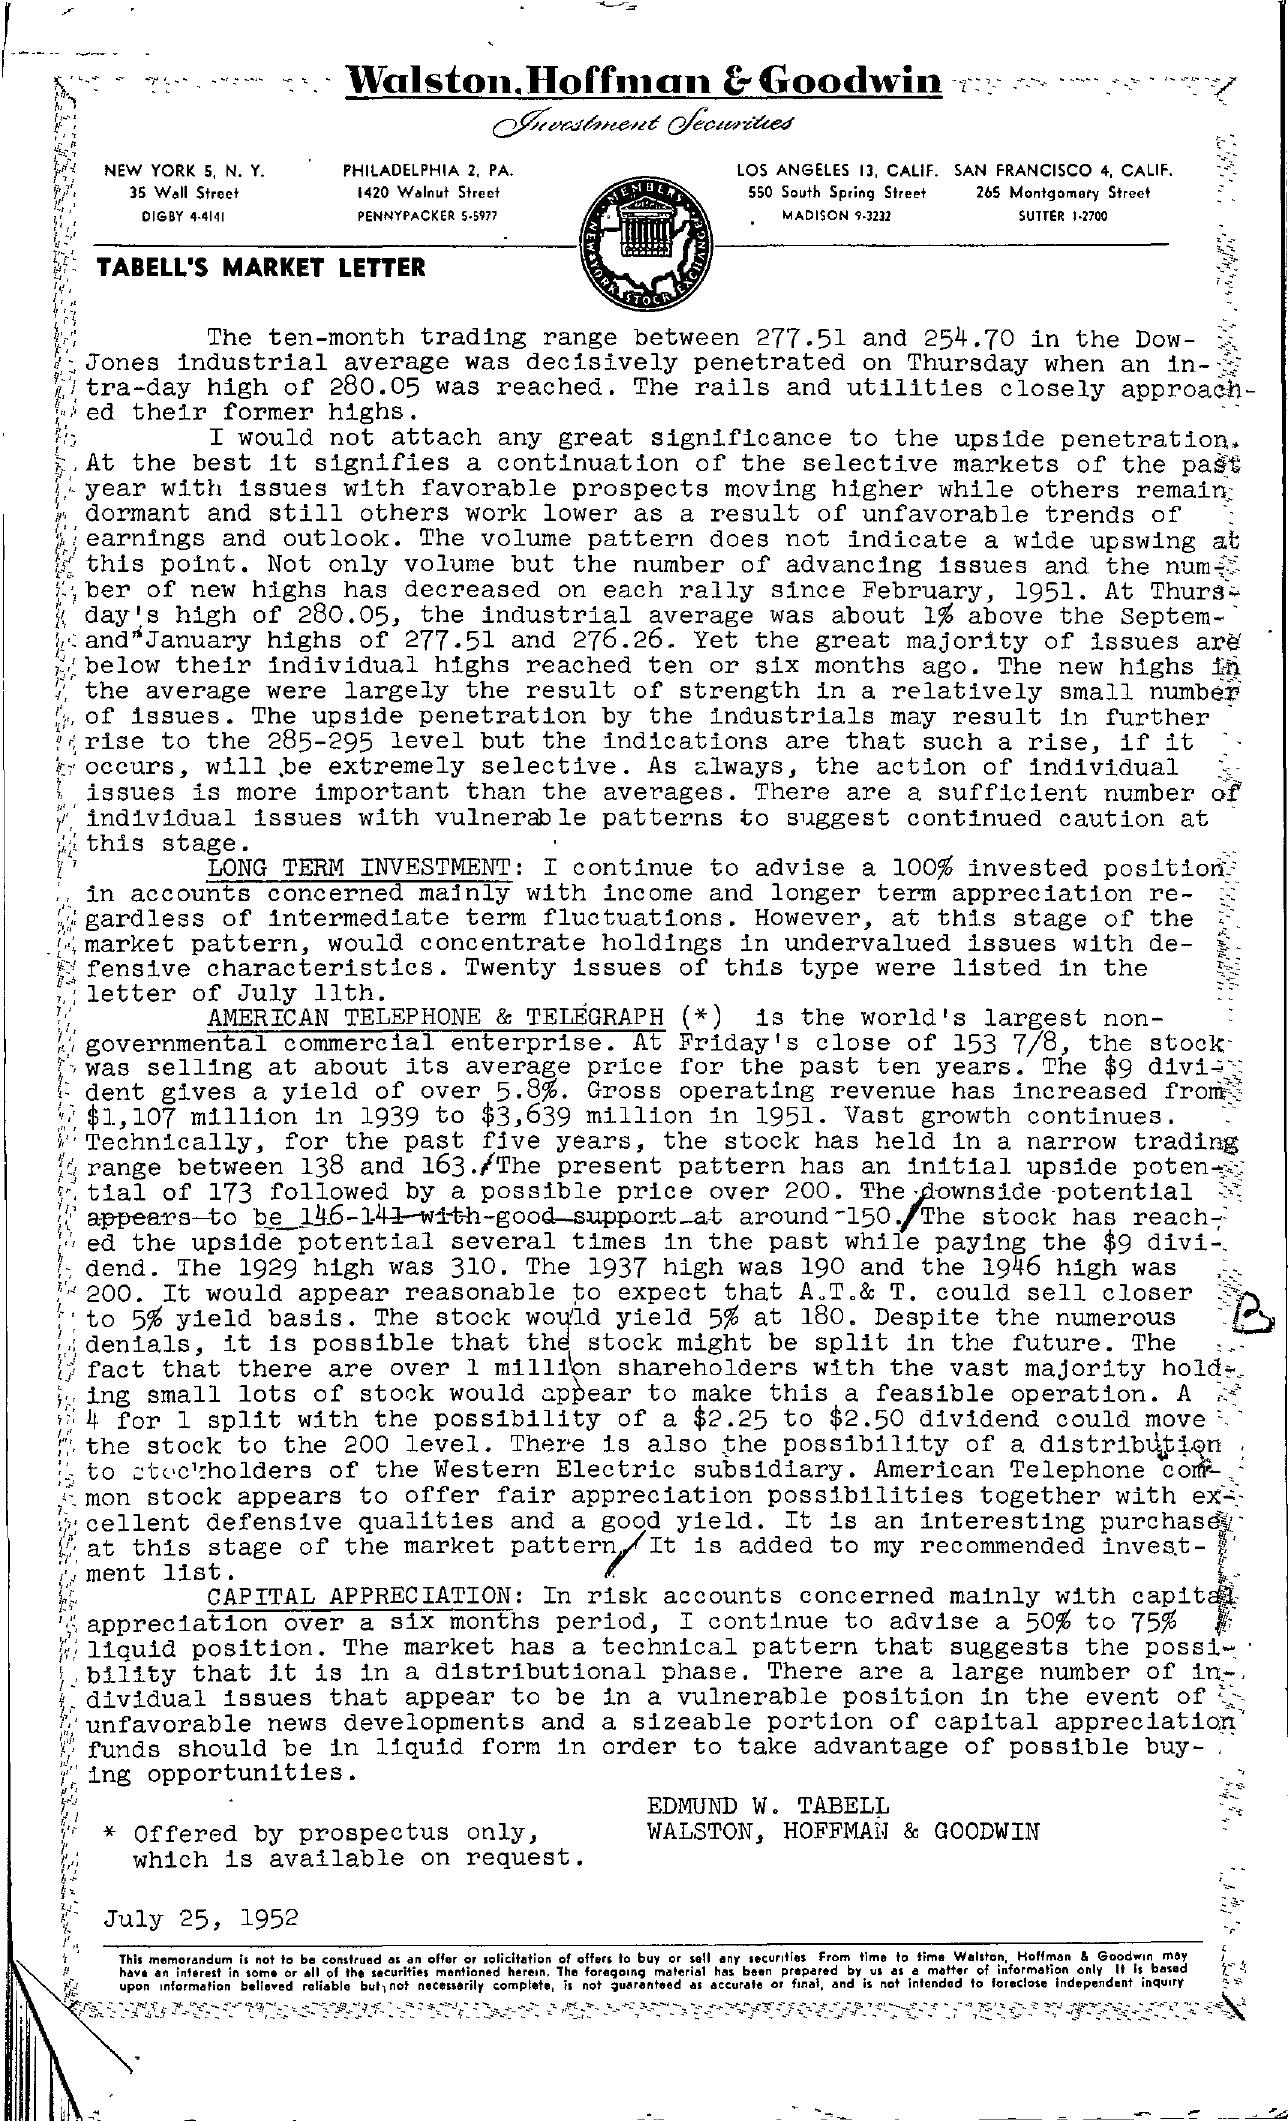 Tabell's Market Letter - July 25, 1952